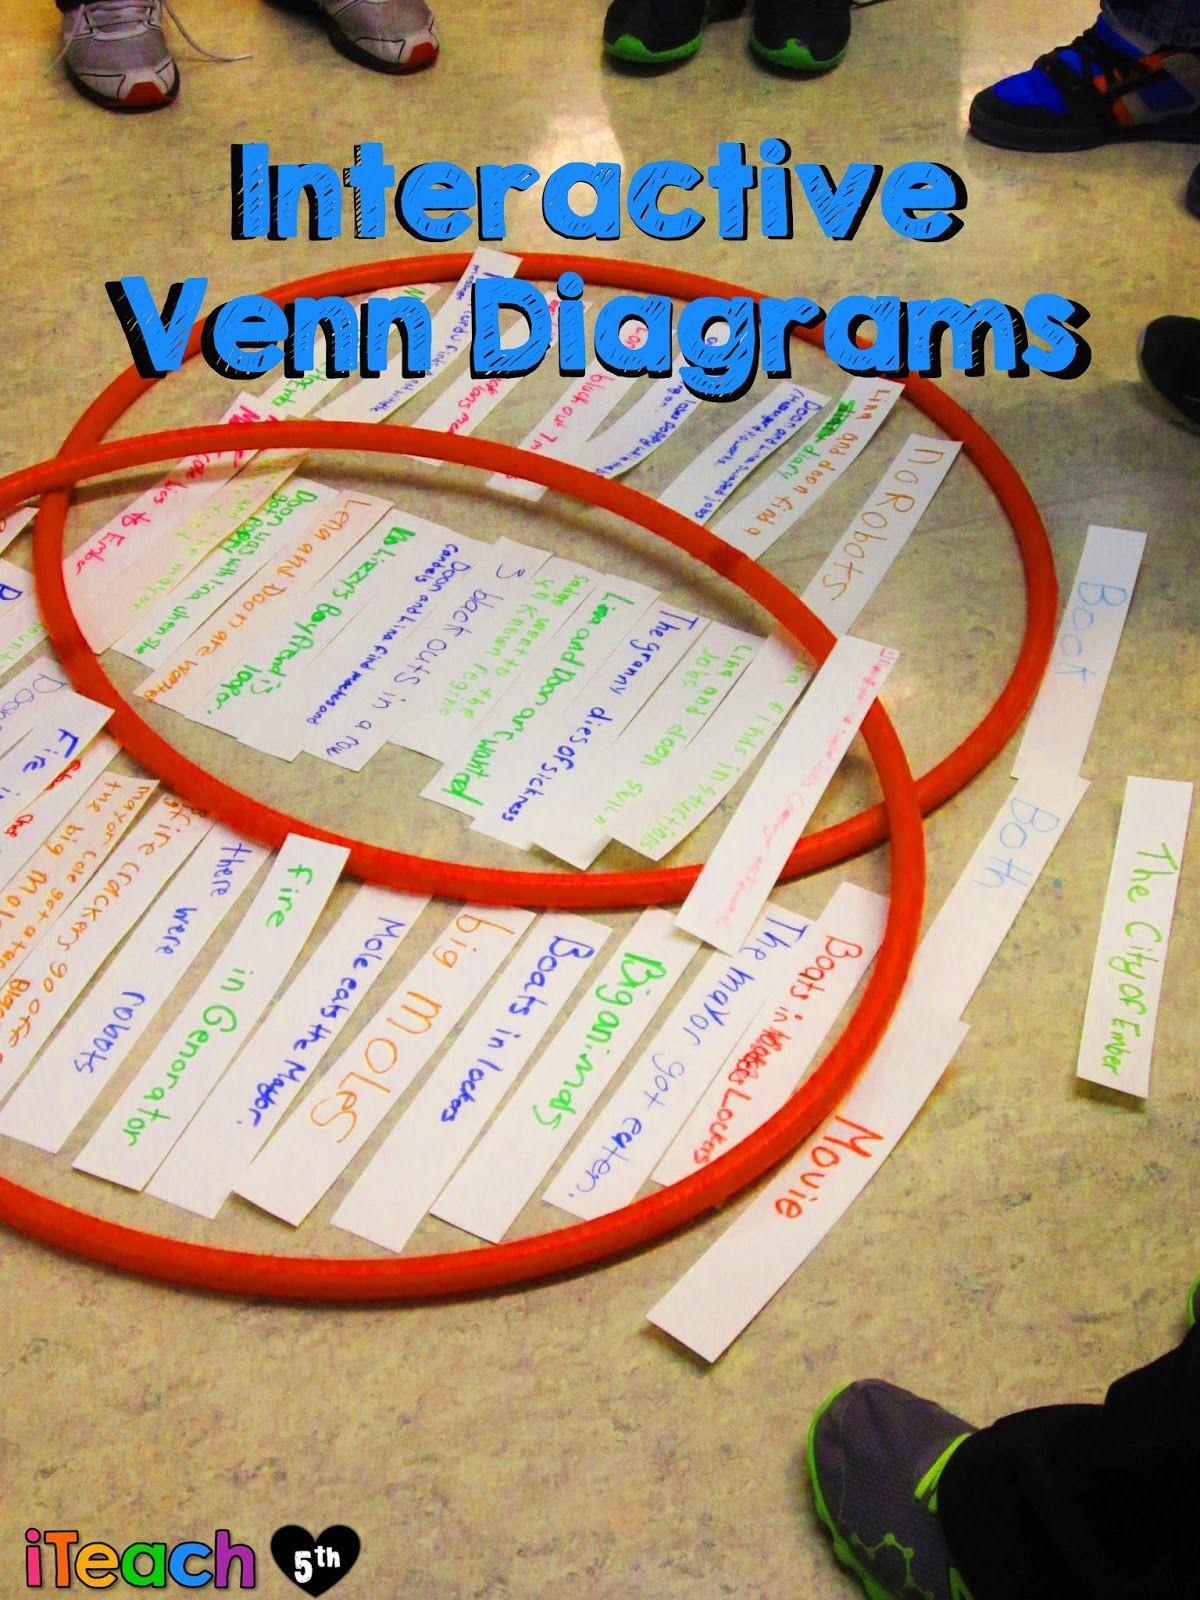 Iteach fifth 5th grade teaching resources interactive venn iteach fifth 5th grade teaching resources interactive venn diagrams ccuart Image collections